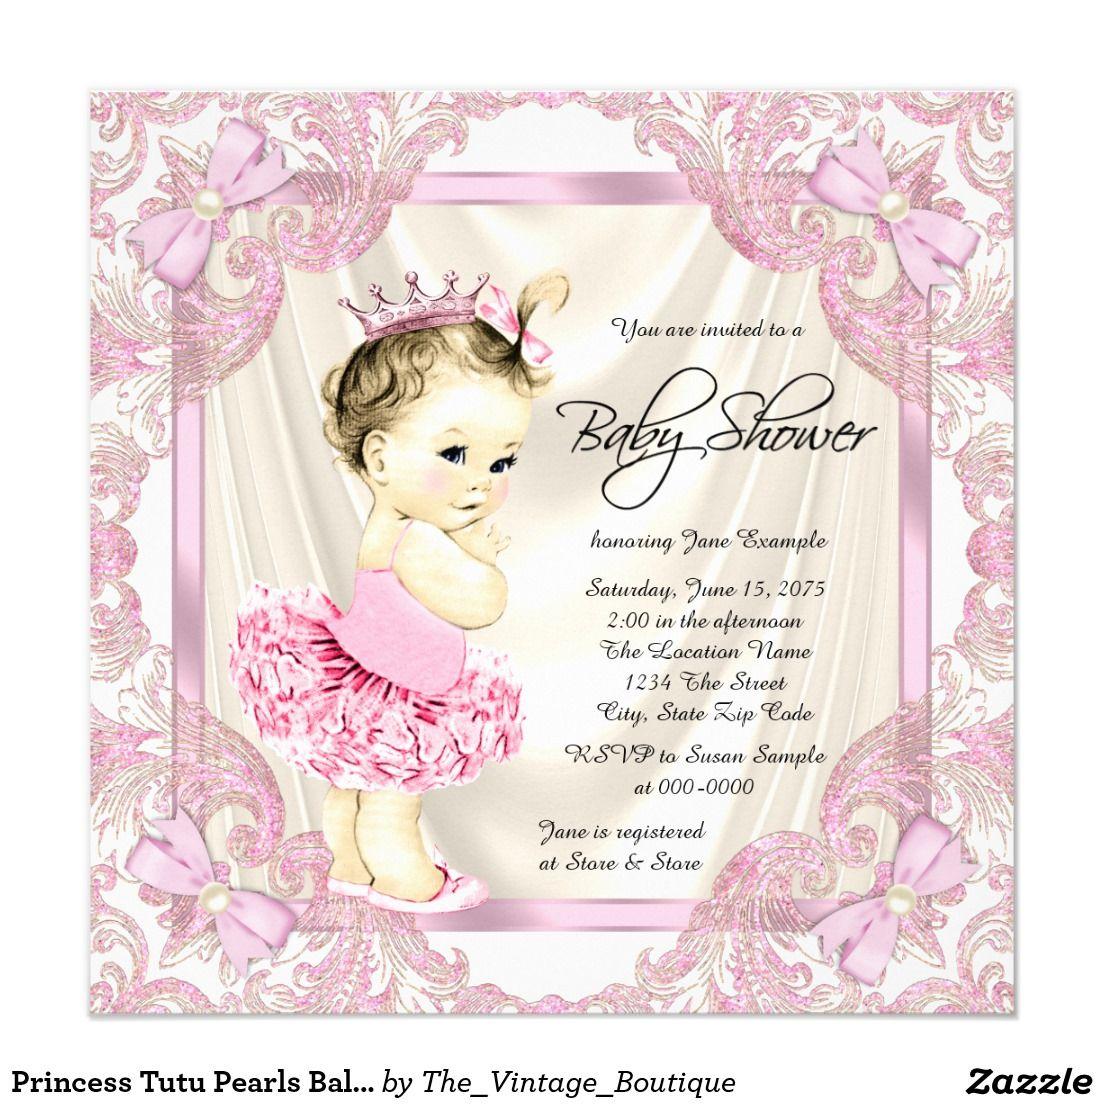 Princess Tutu Pearls Ballerina Baby Shower Card | Ballerina baby ...